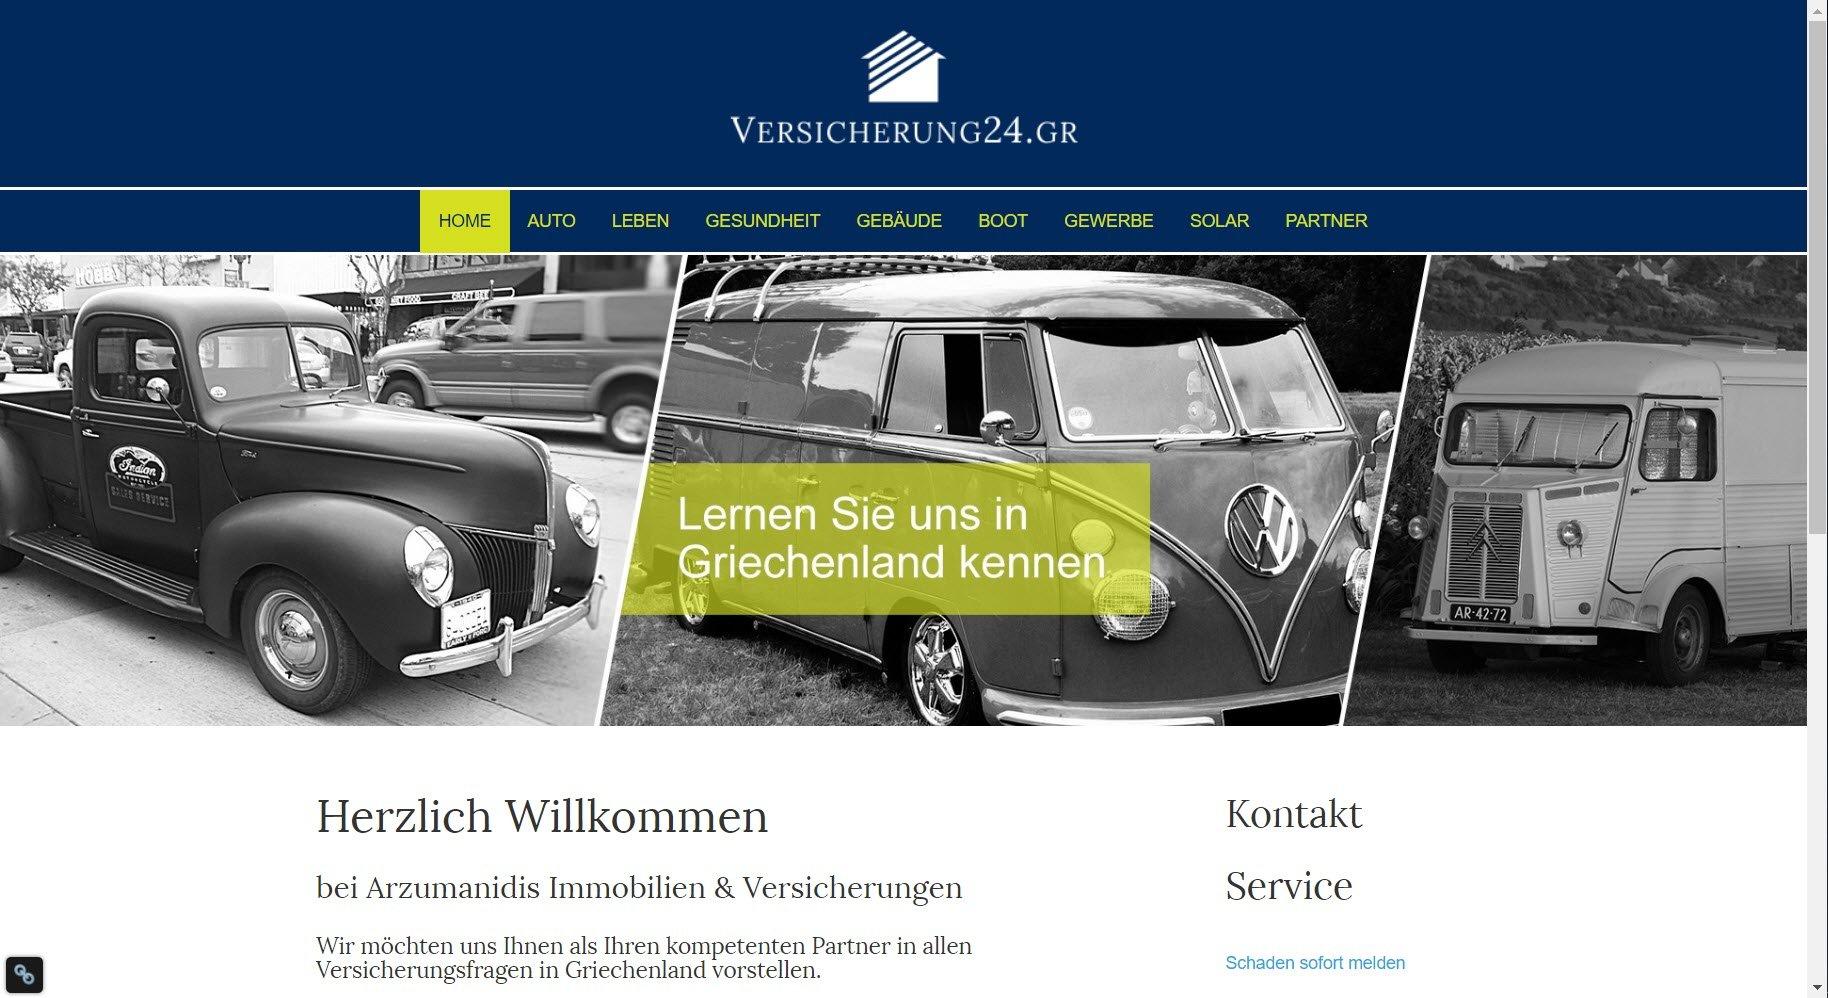 versicherung24-gr-versicherungen-internetblogger-de